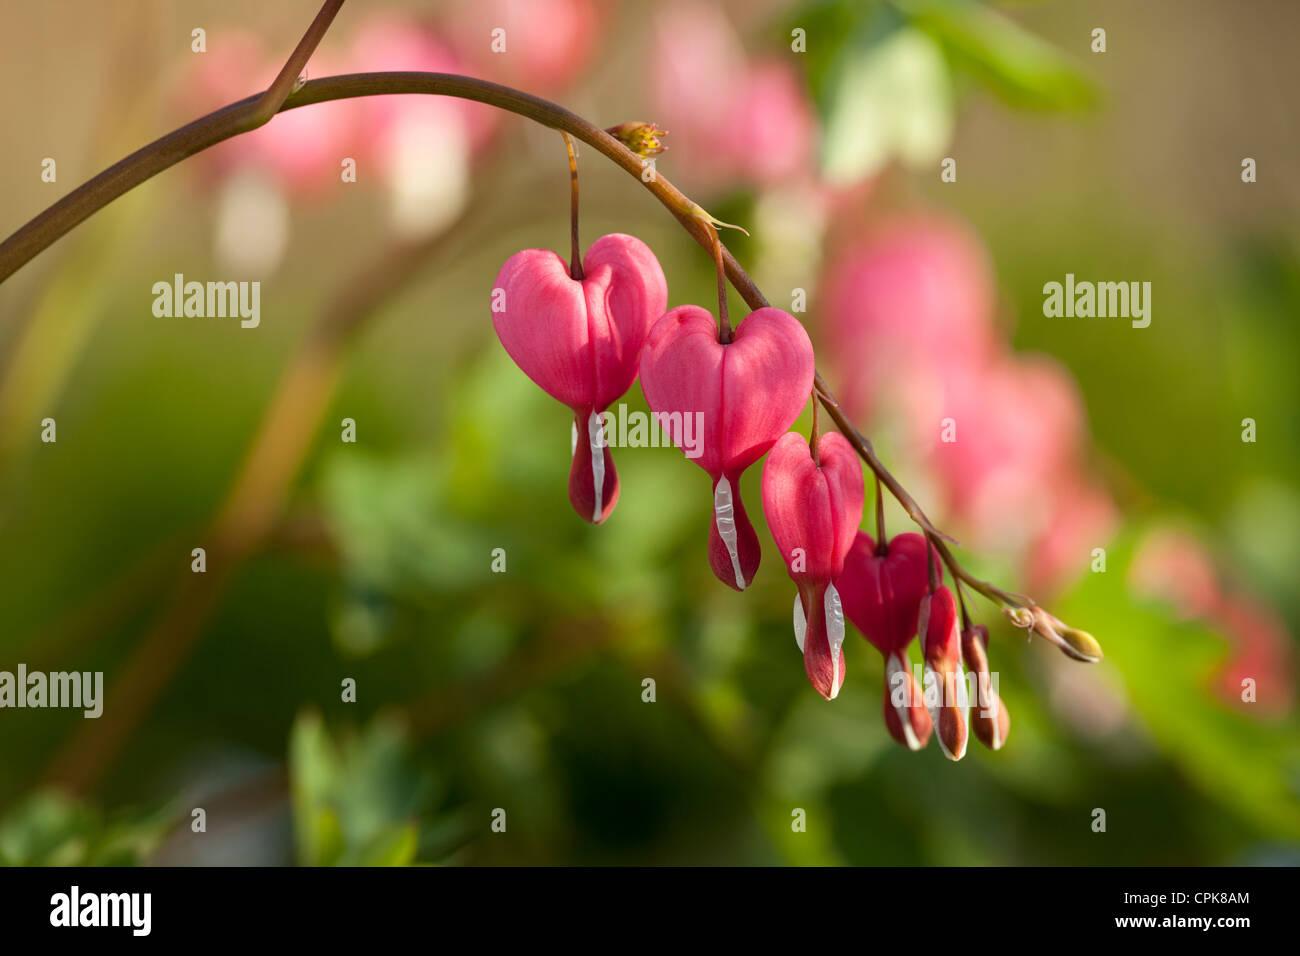 flower in heart shape (Lamprocapnos spectabilis) in garden - Stock Image